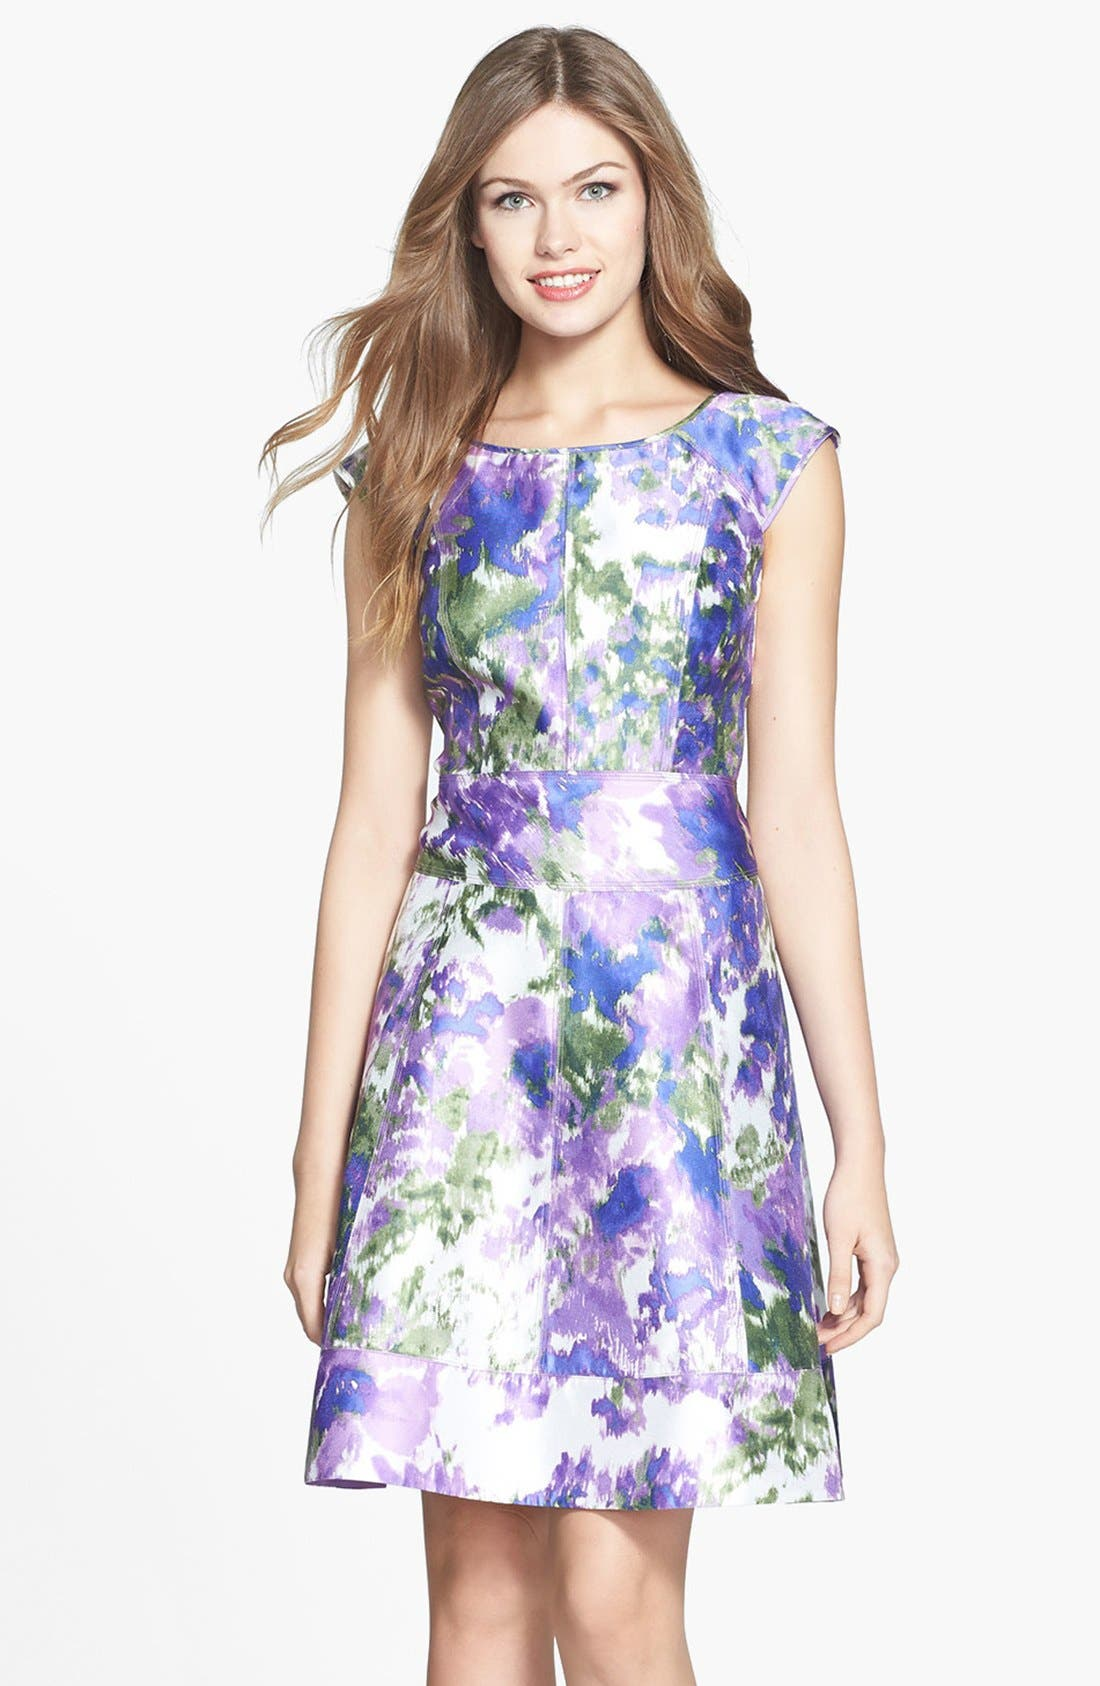 Alternate Image 1 Selected - Maggy London Print Taffeta Fit & Flare Dress (Regular & Petite)